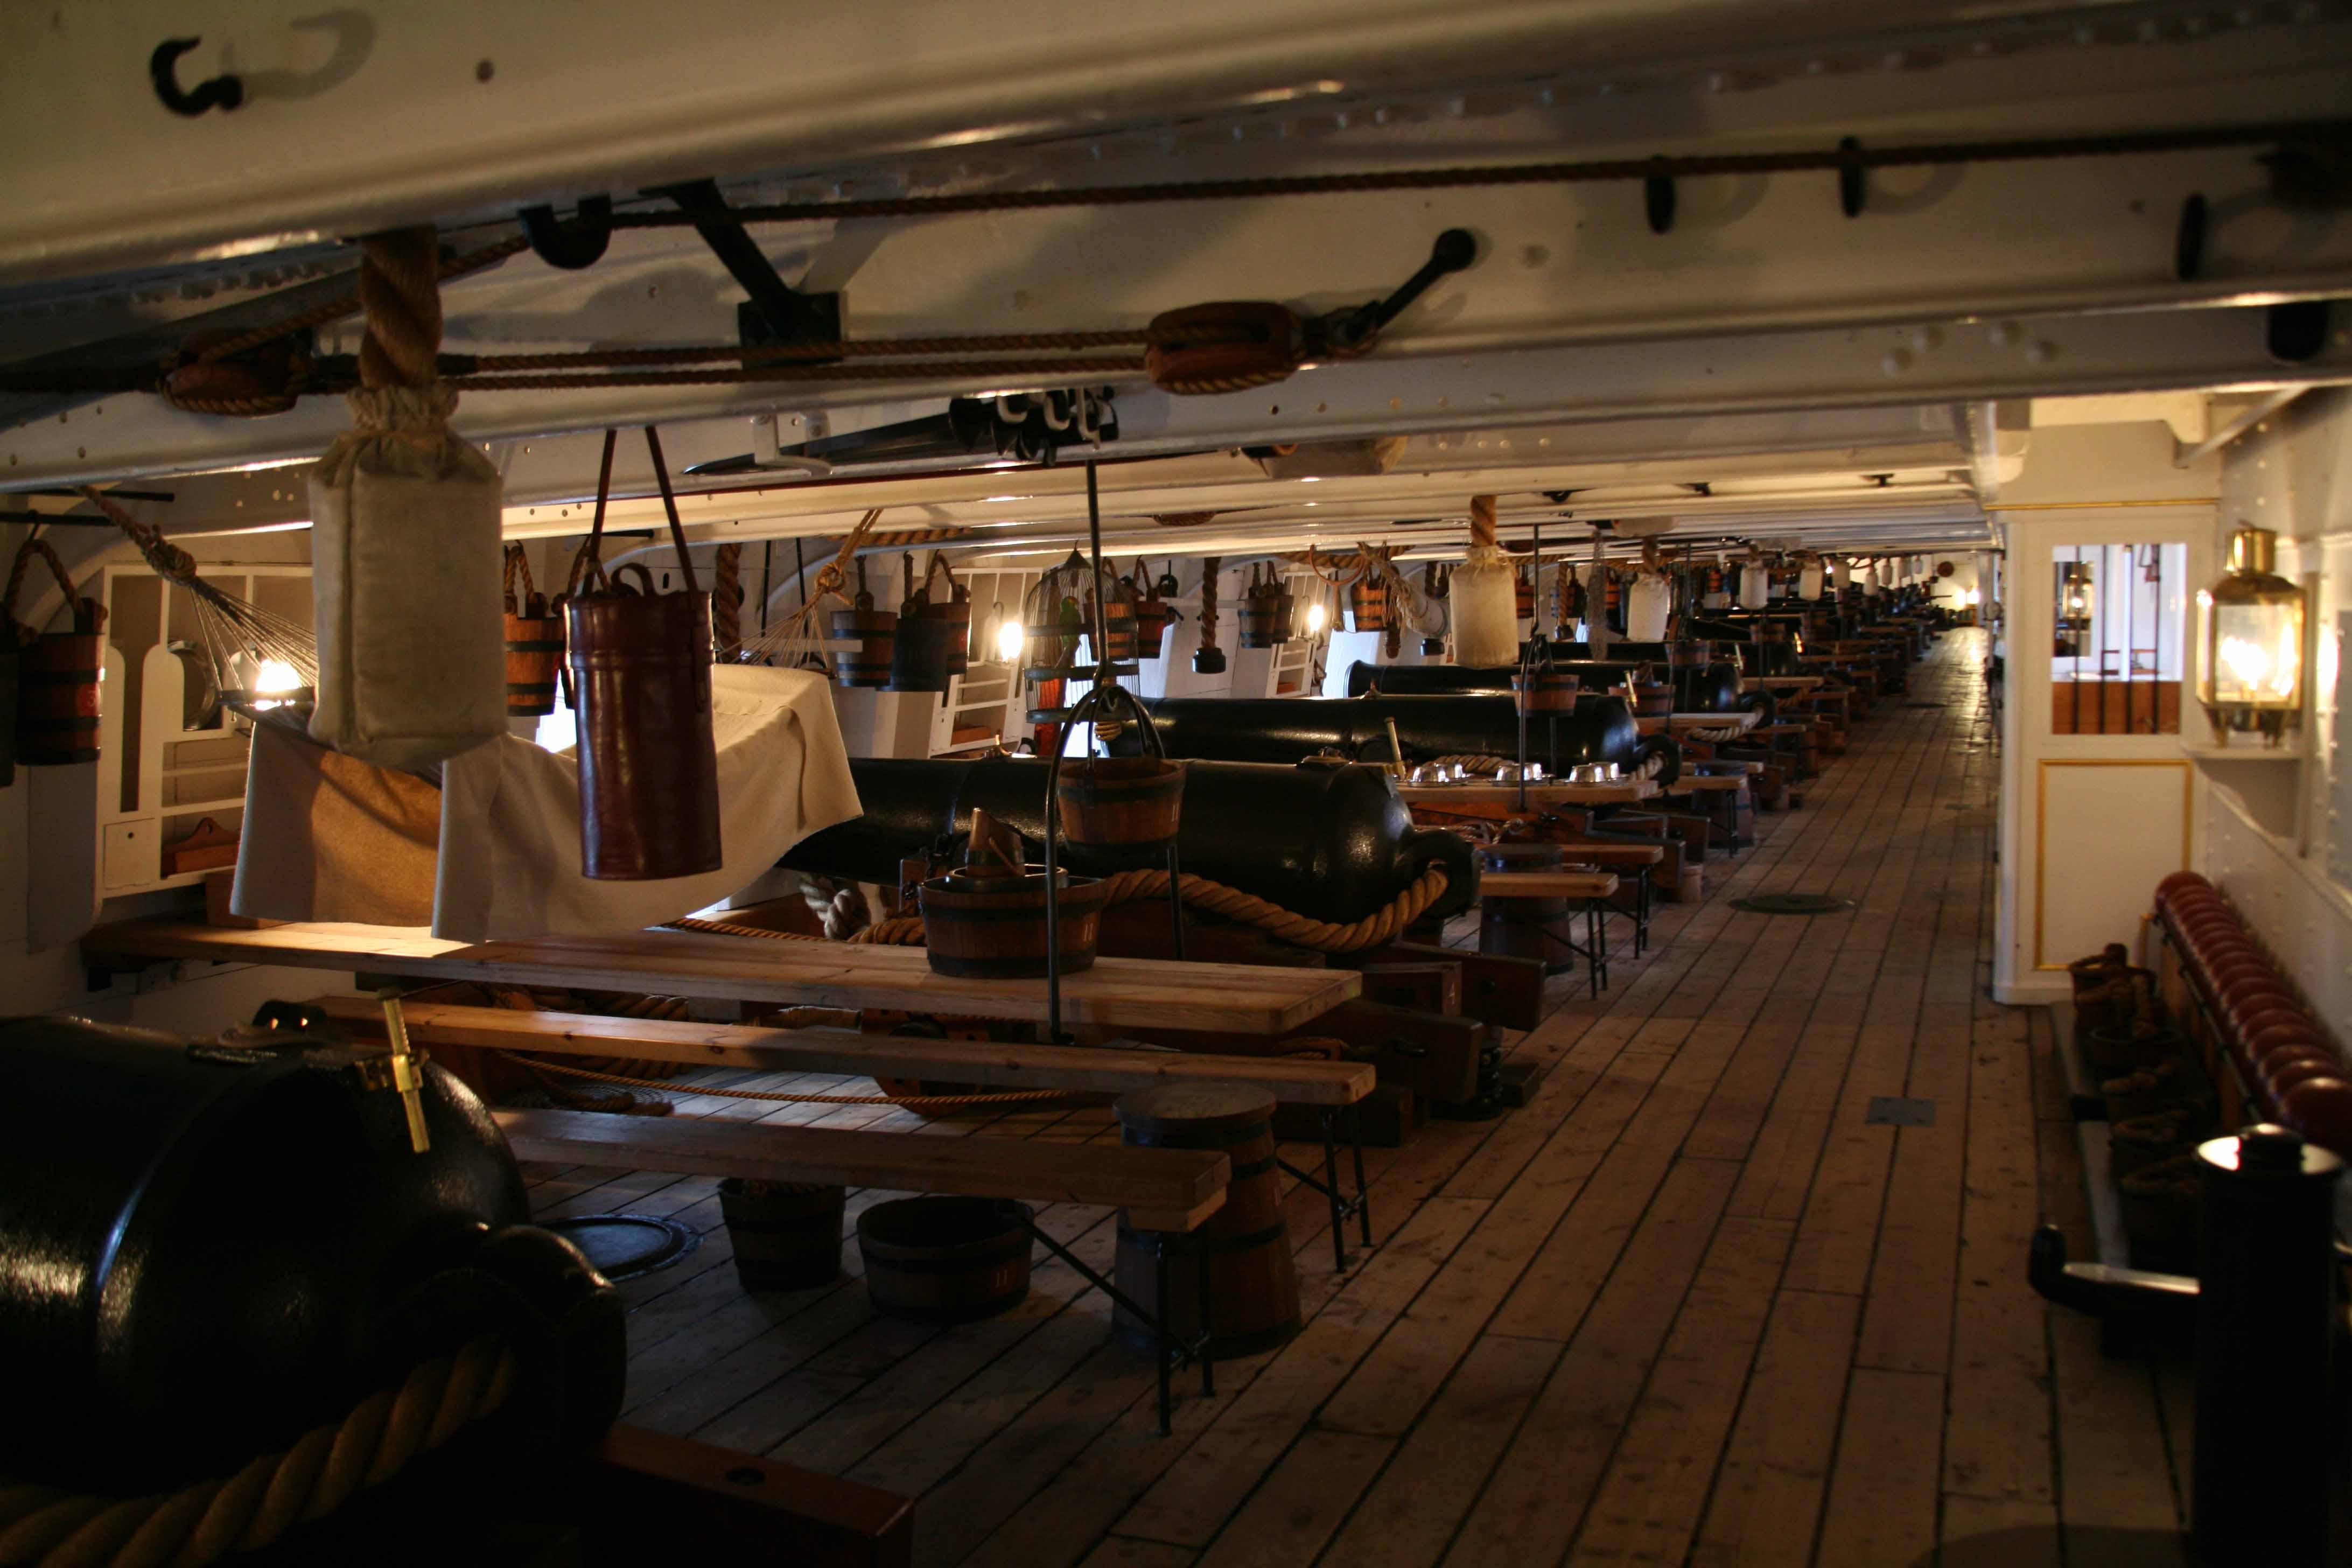 Hms Warrior Of 1860 Portsmouth Historic Dockyard